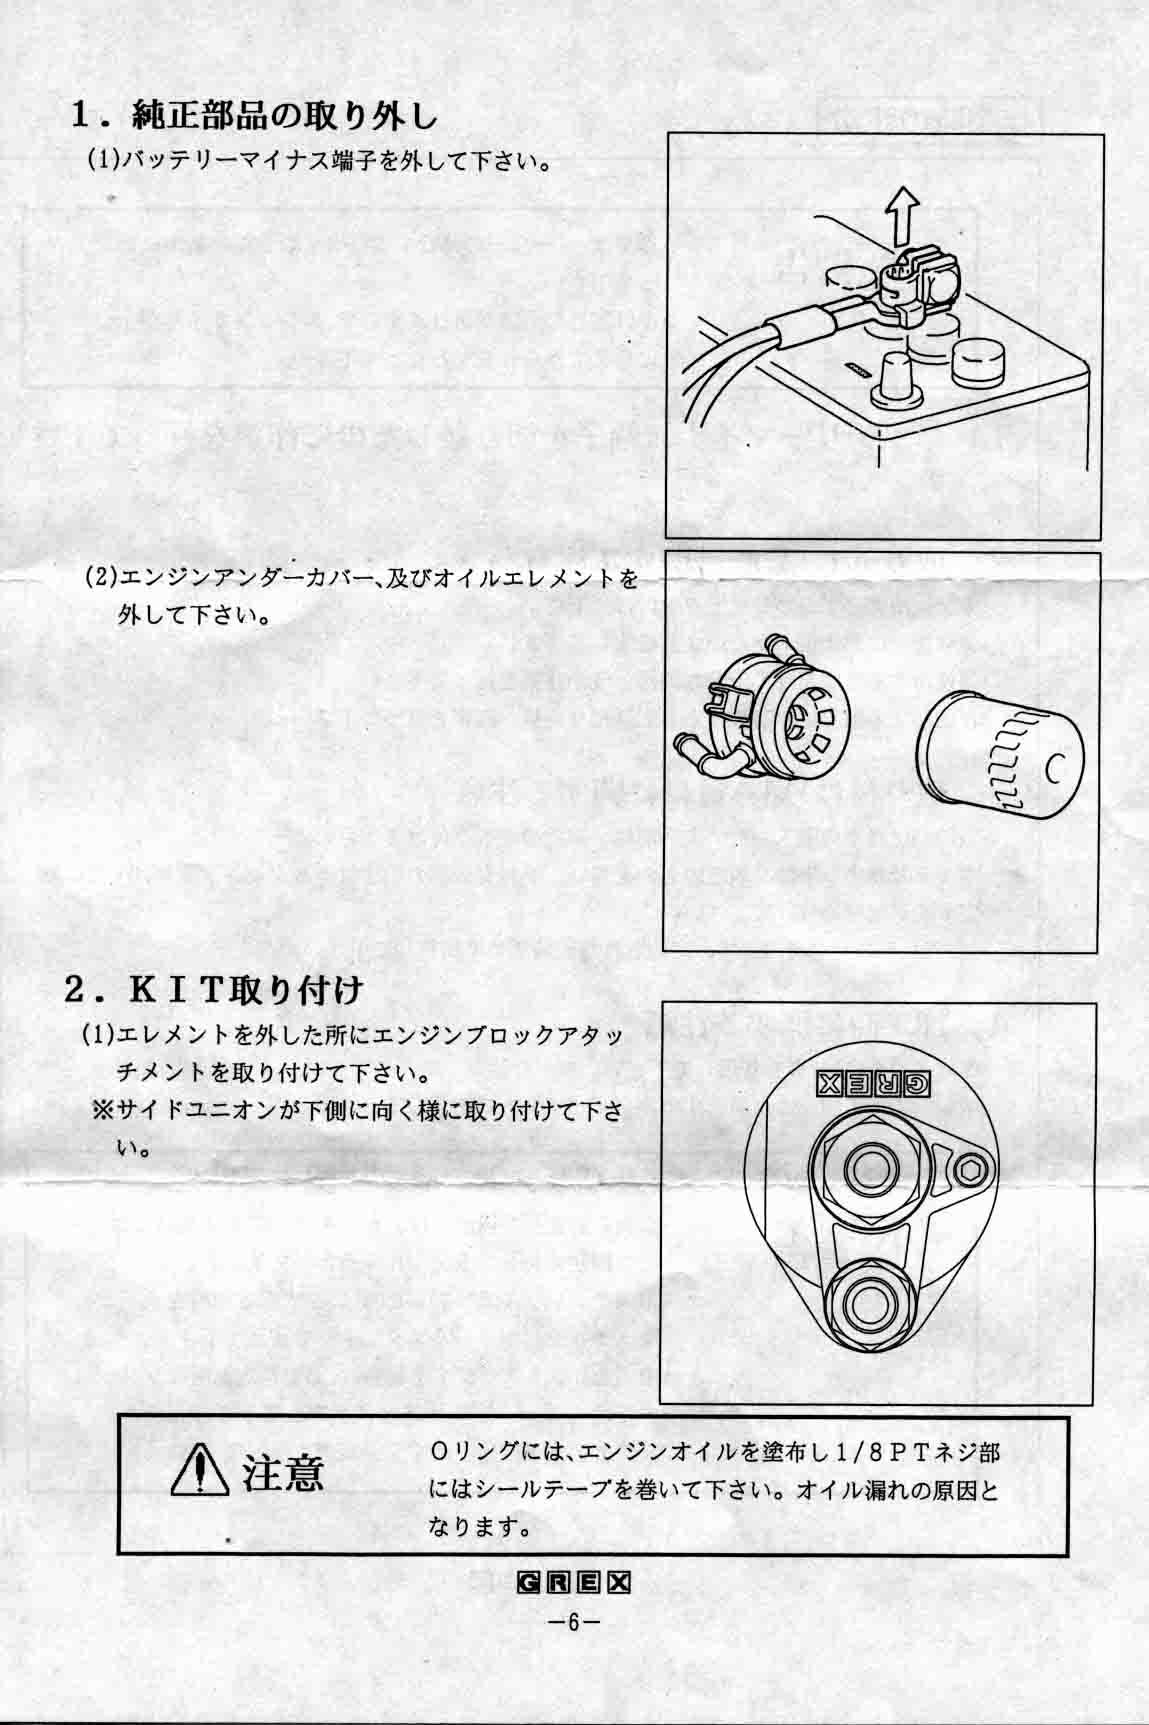 Greddy oil filter relocation kit photos – manual